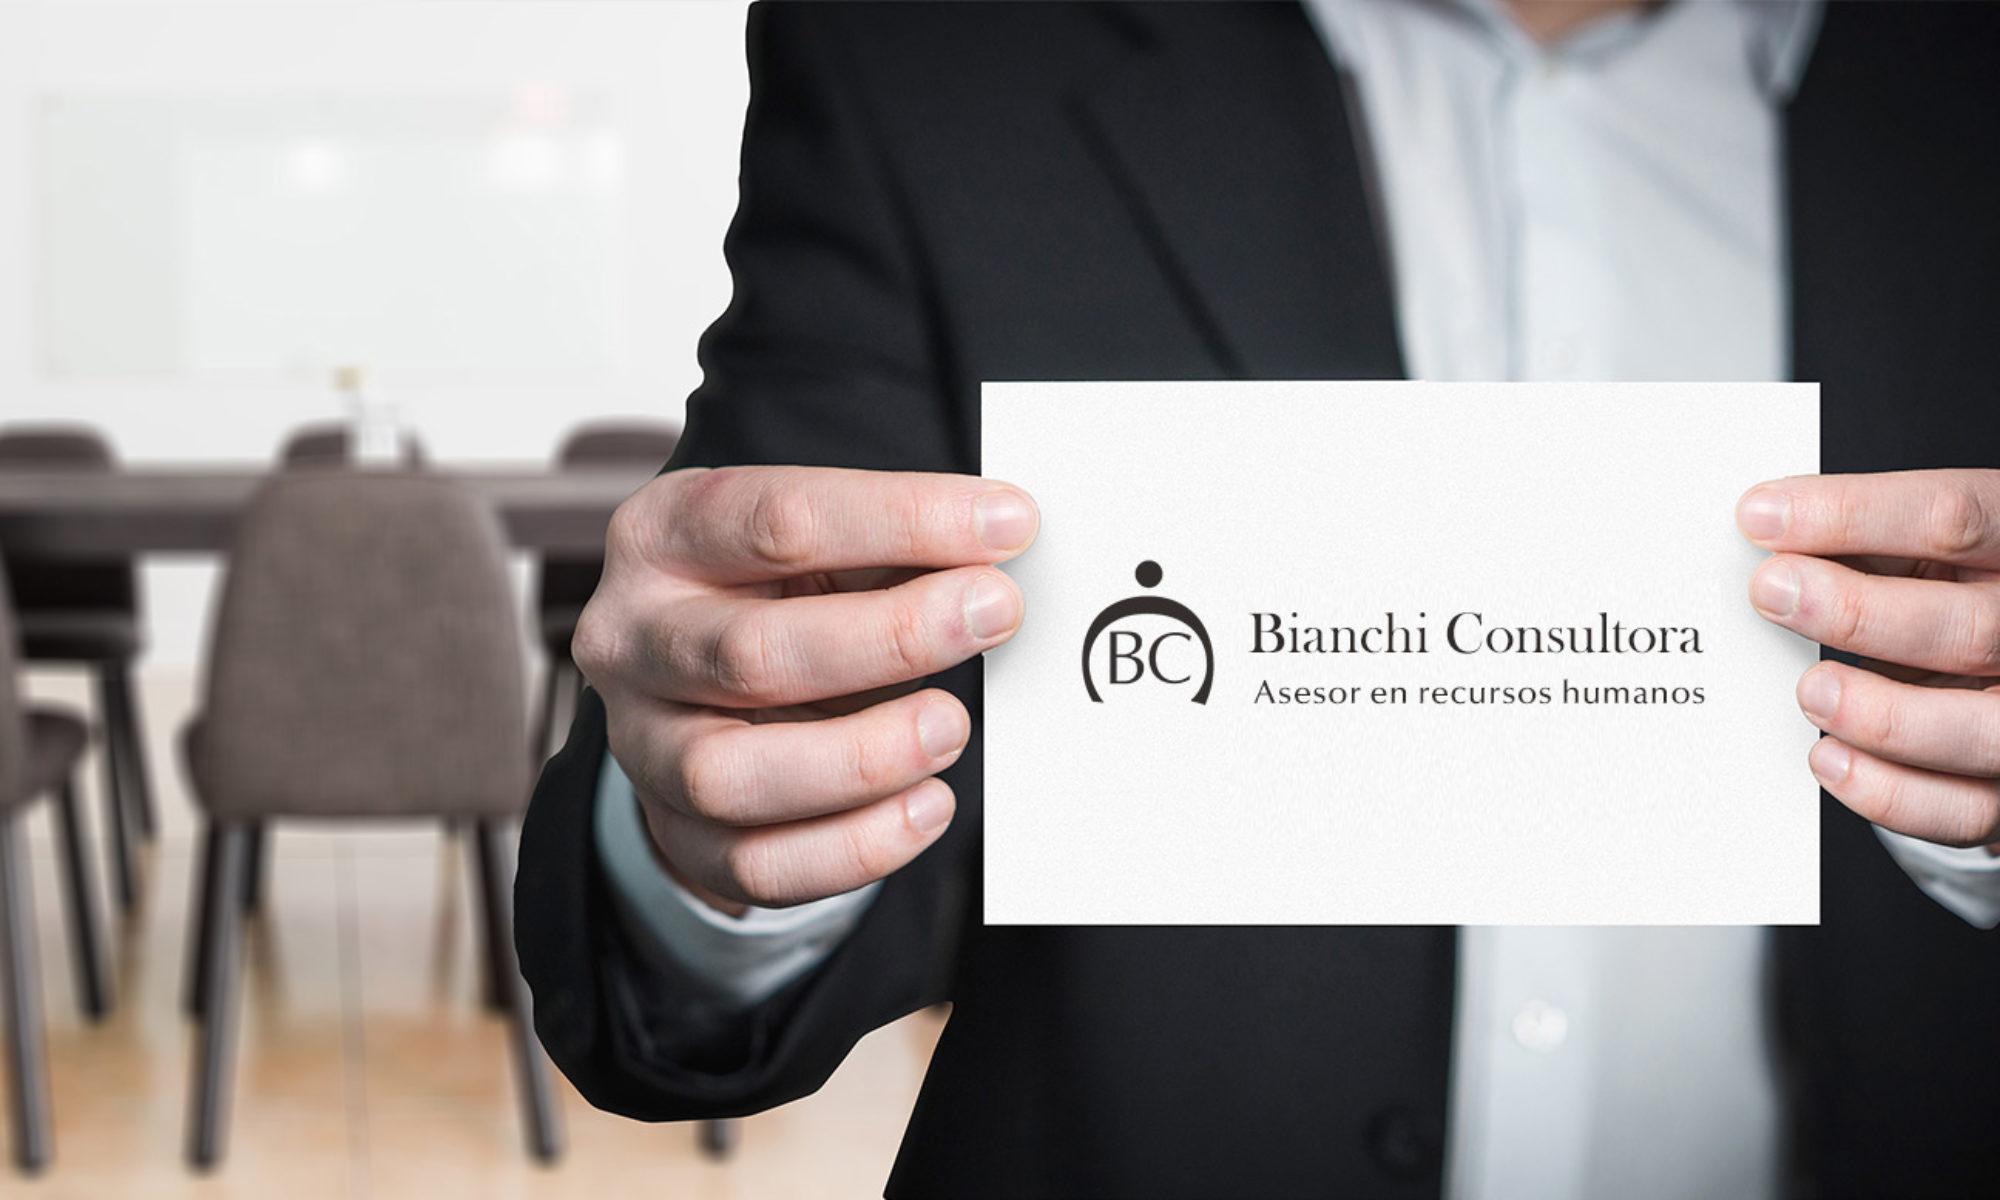 Bianchi Consultora